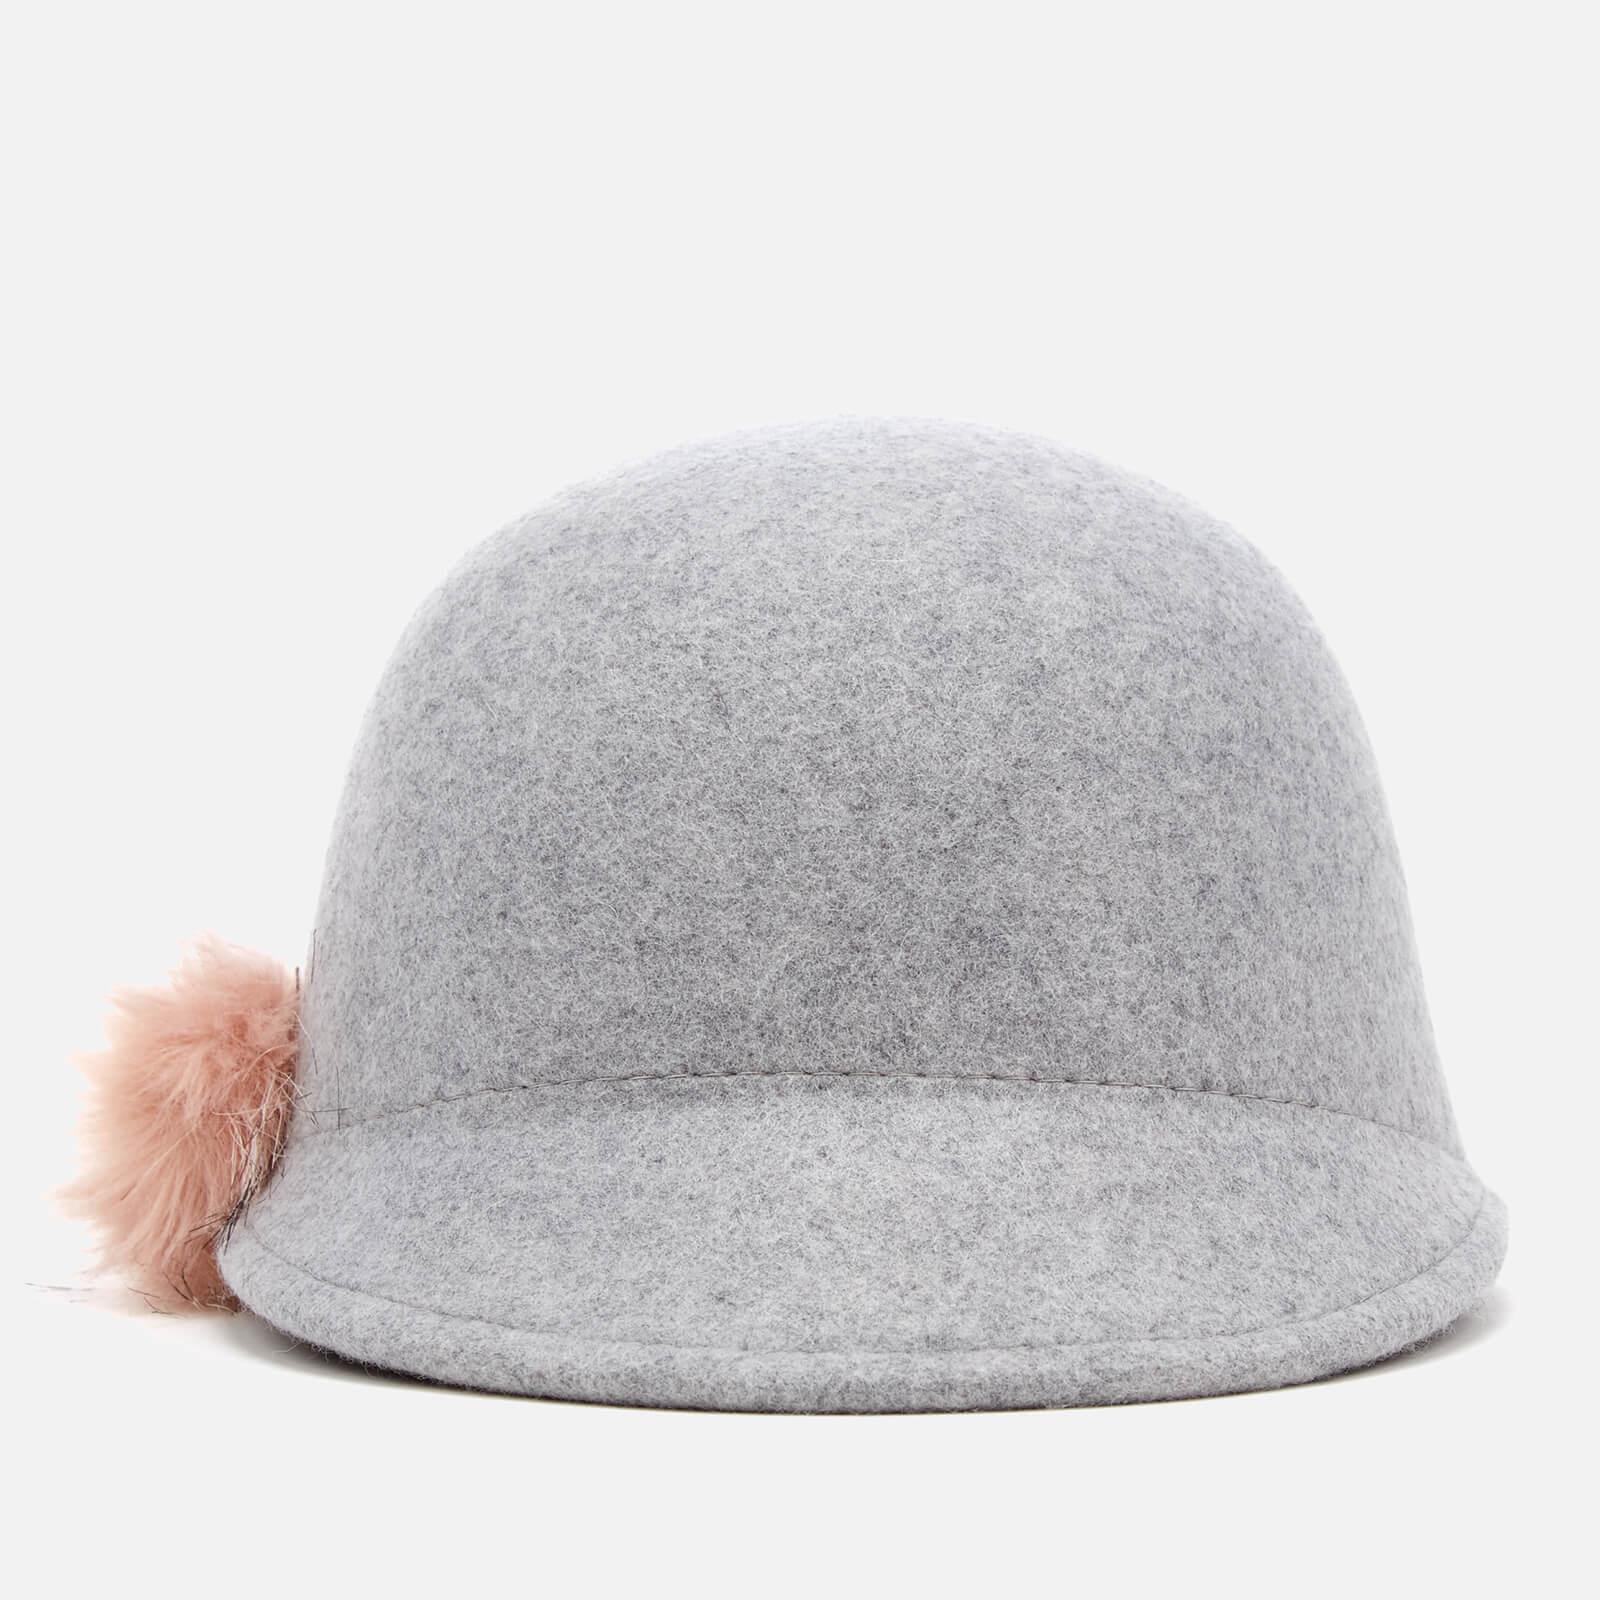 Lyst - Ted Baker Adabel Faux Fur Pom Pom Felt Hat in Gray dda6fc965e5d